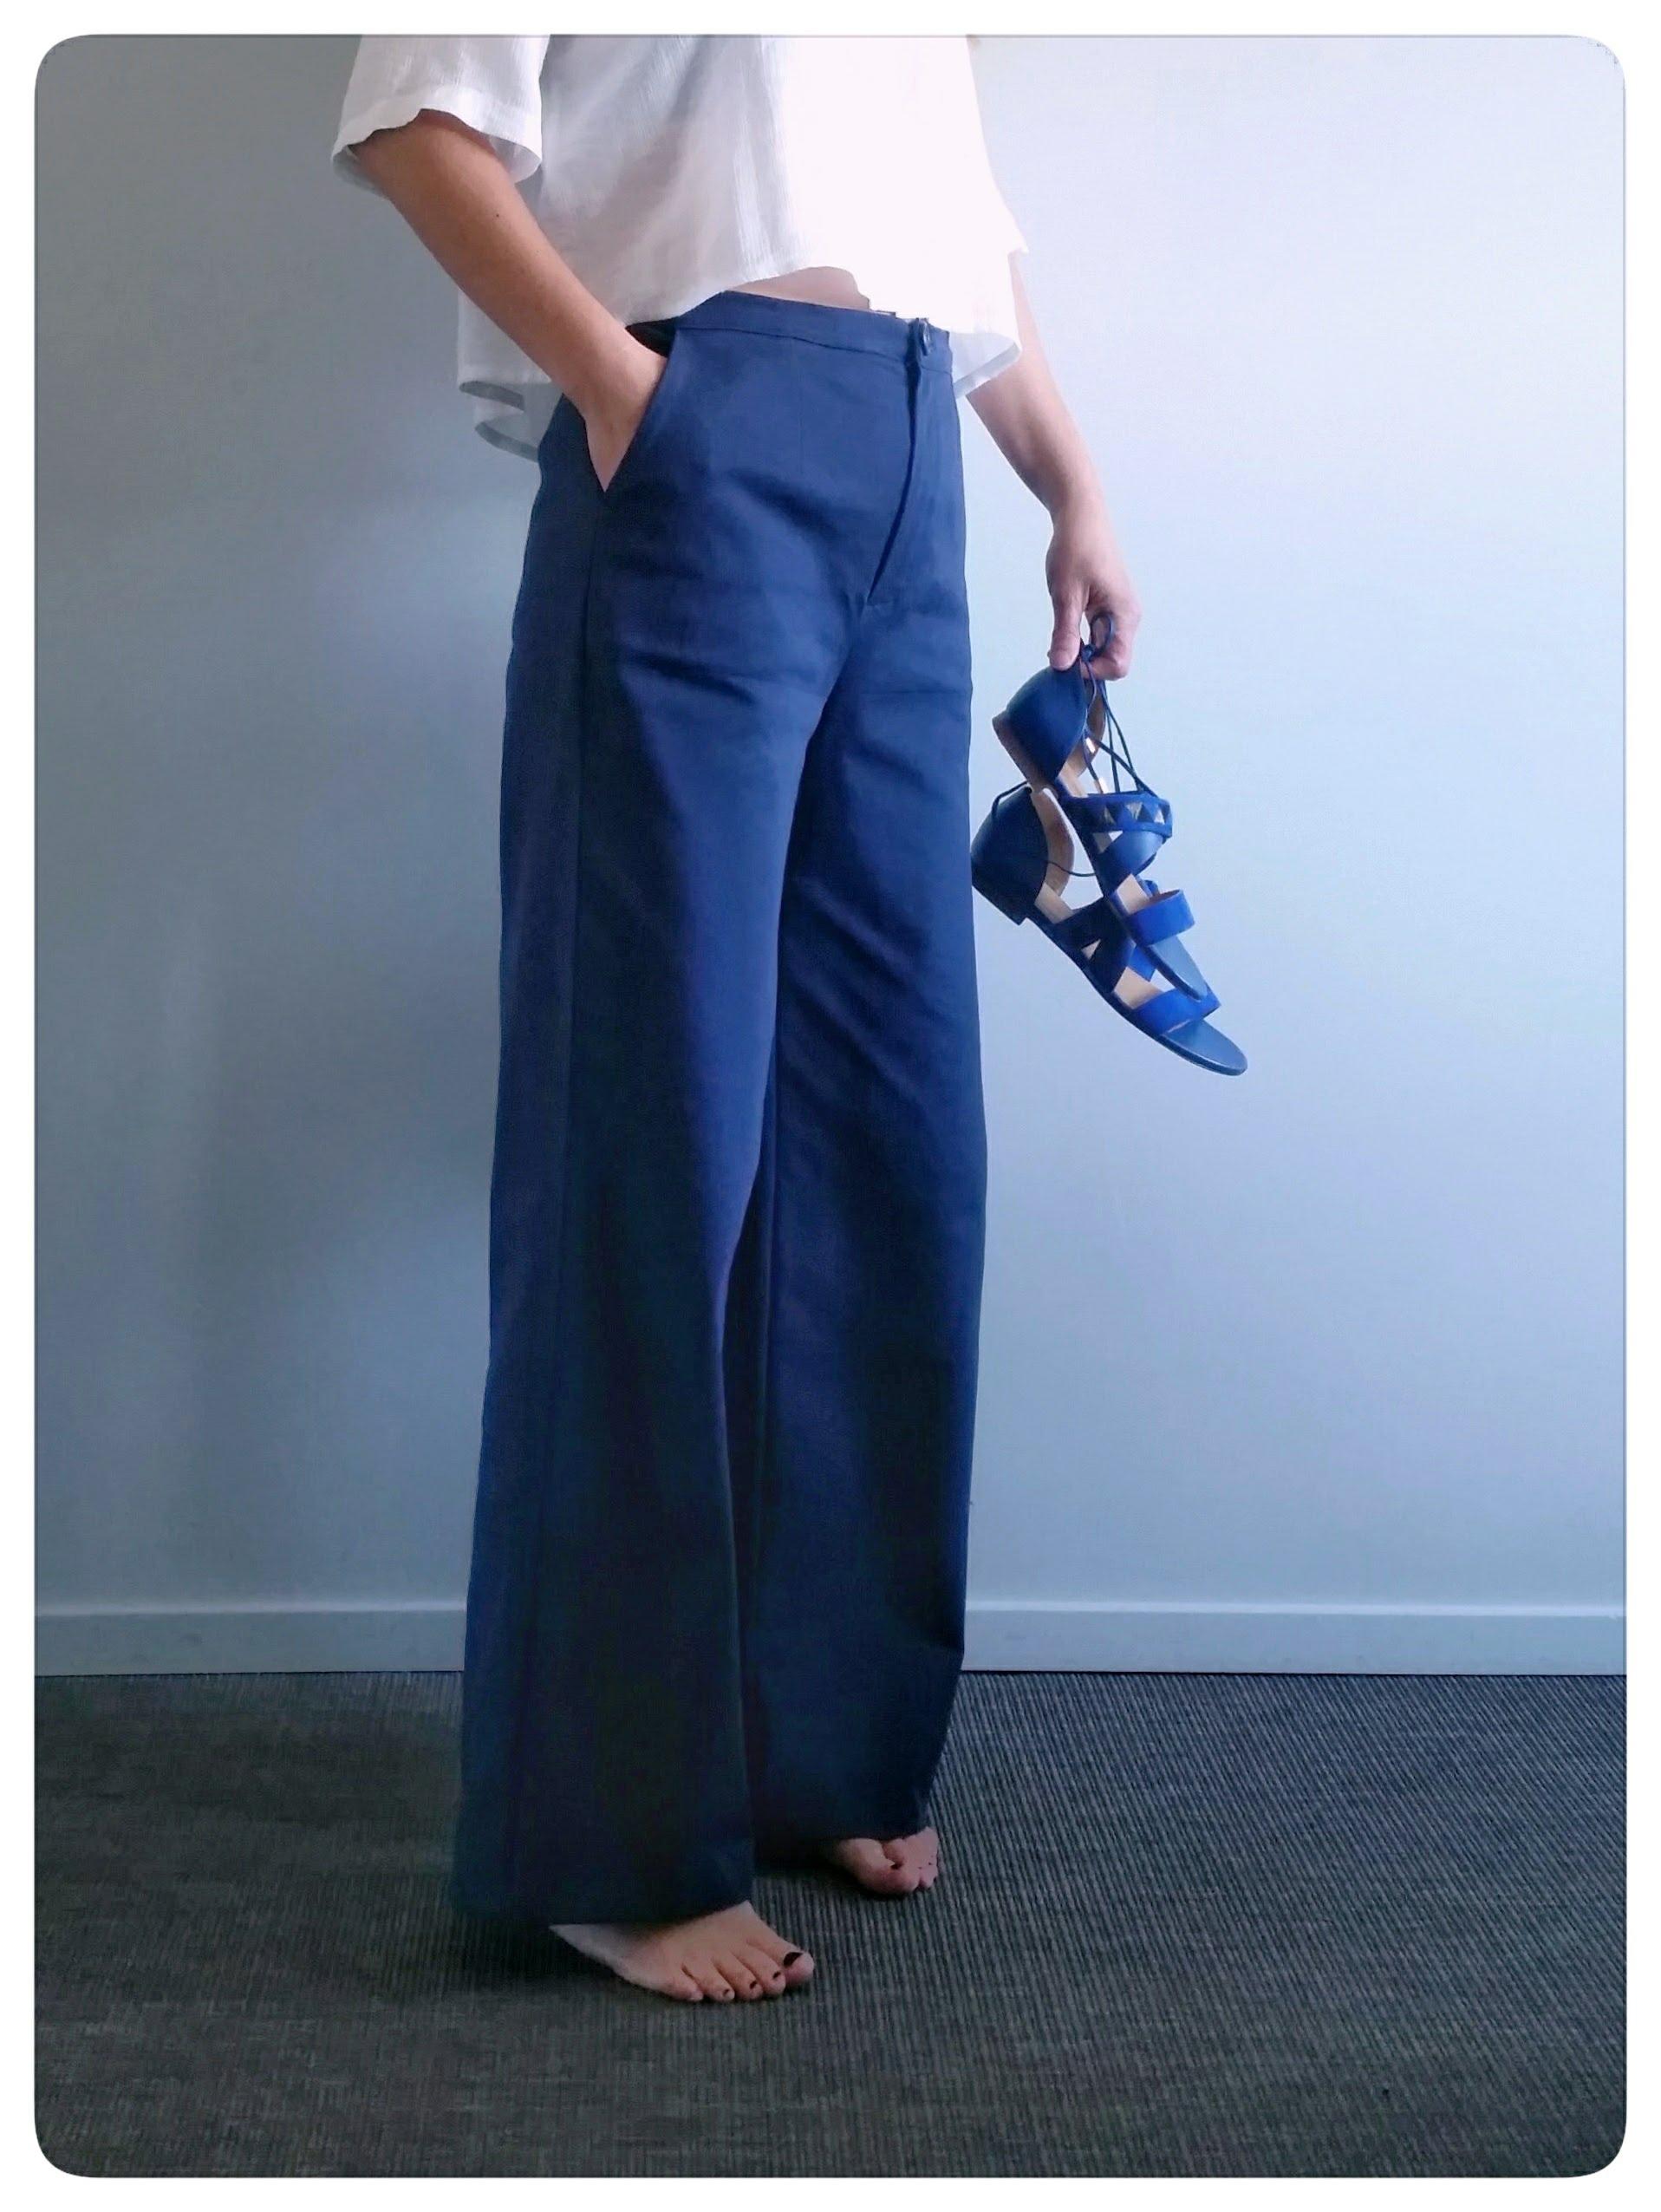 patron de couture femme romarin le pantalon palazzo. Black Bedroom Furniture Sets. Home Design Ideas